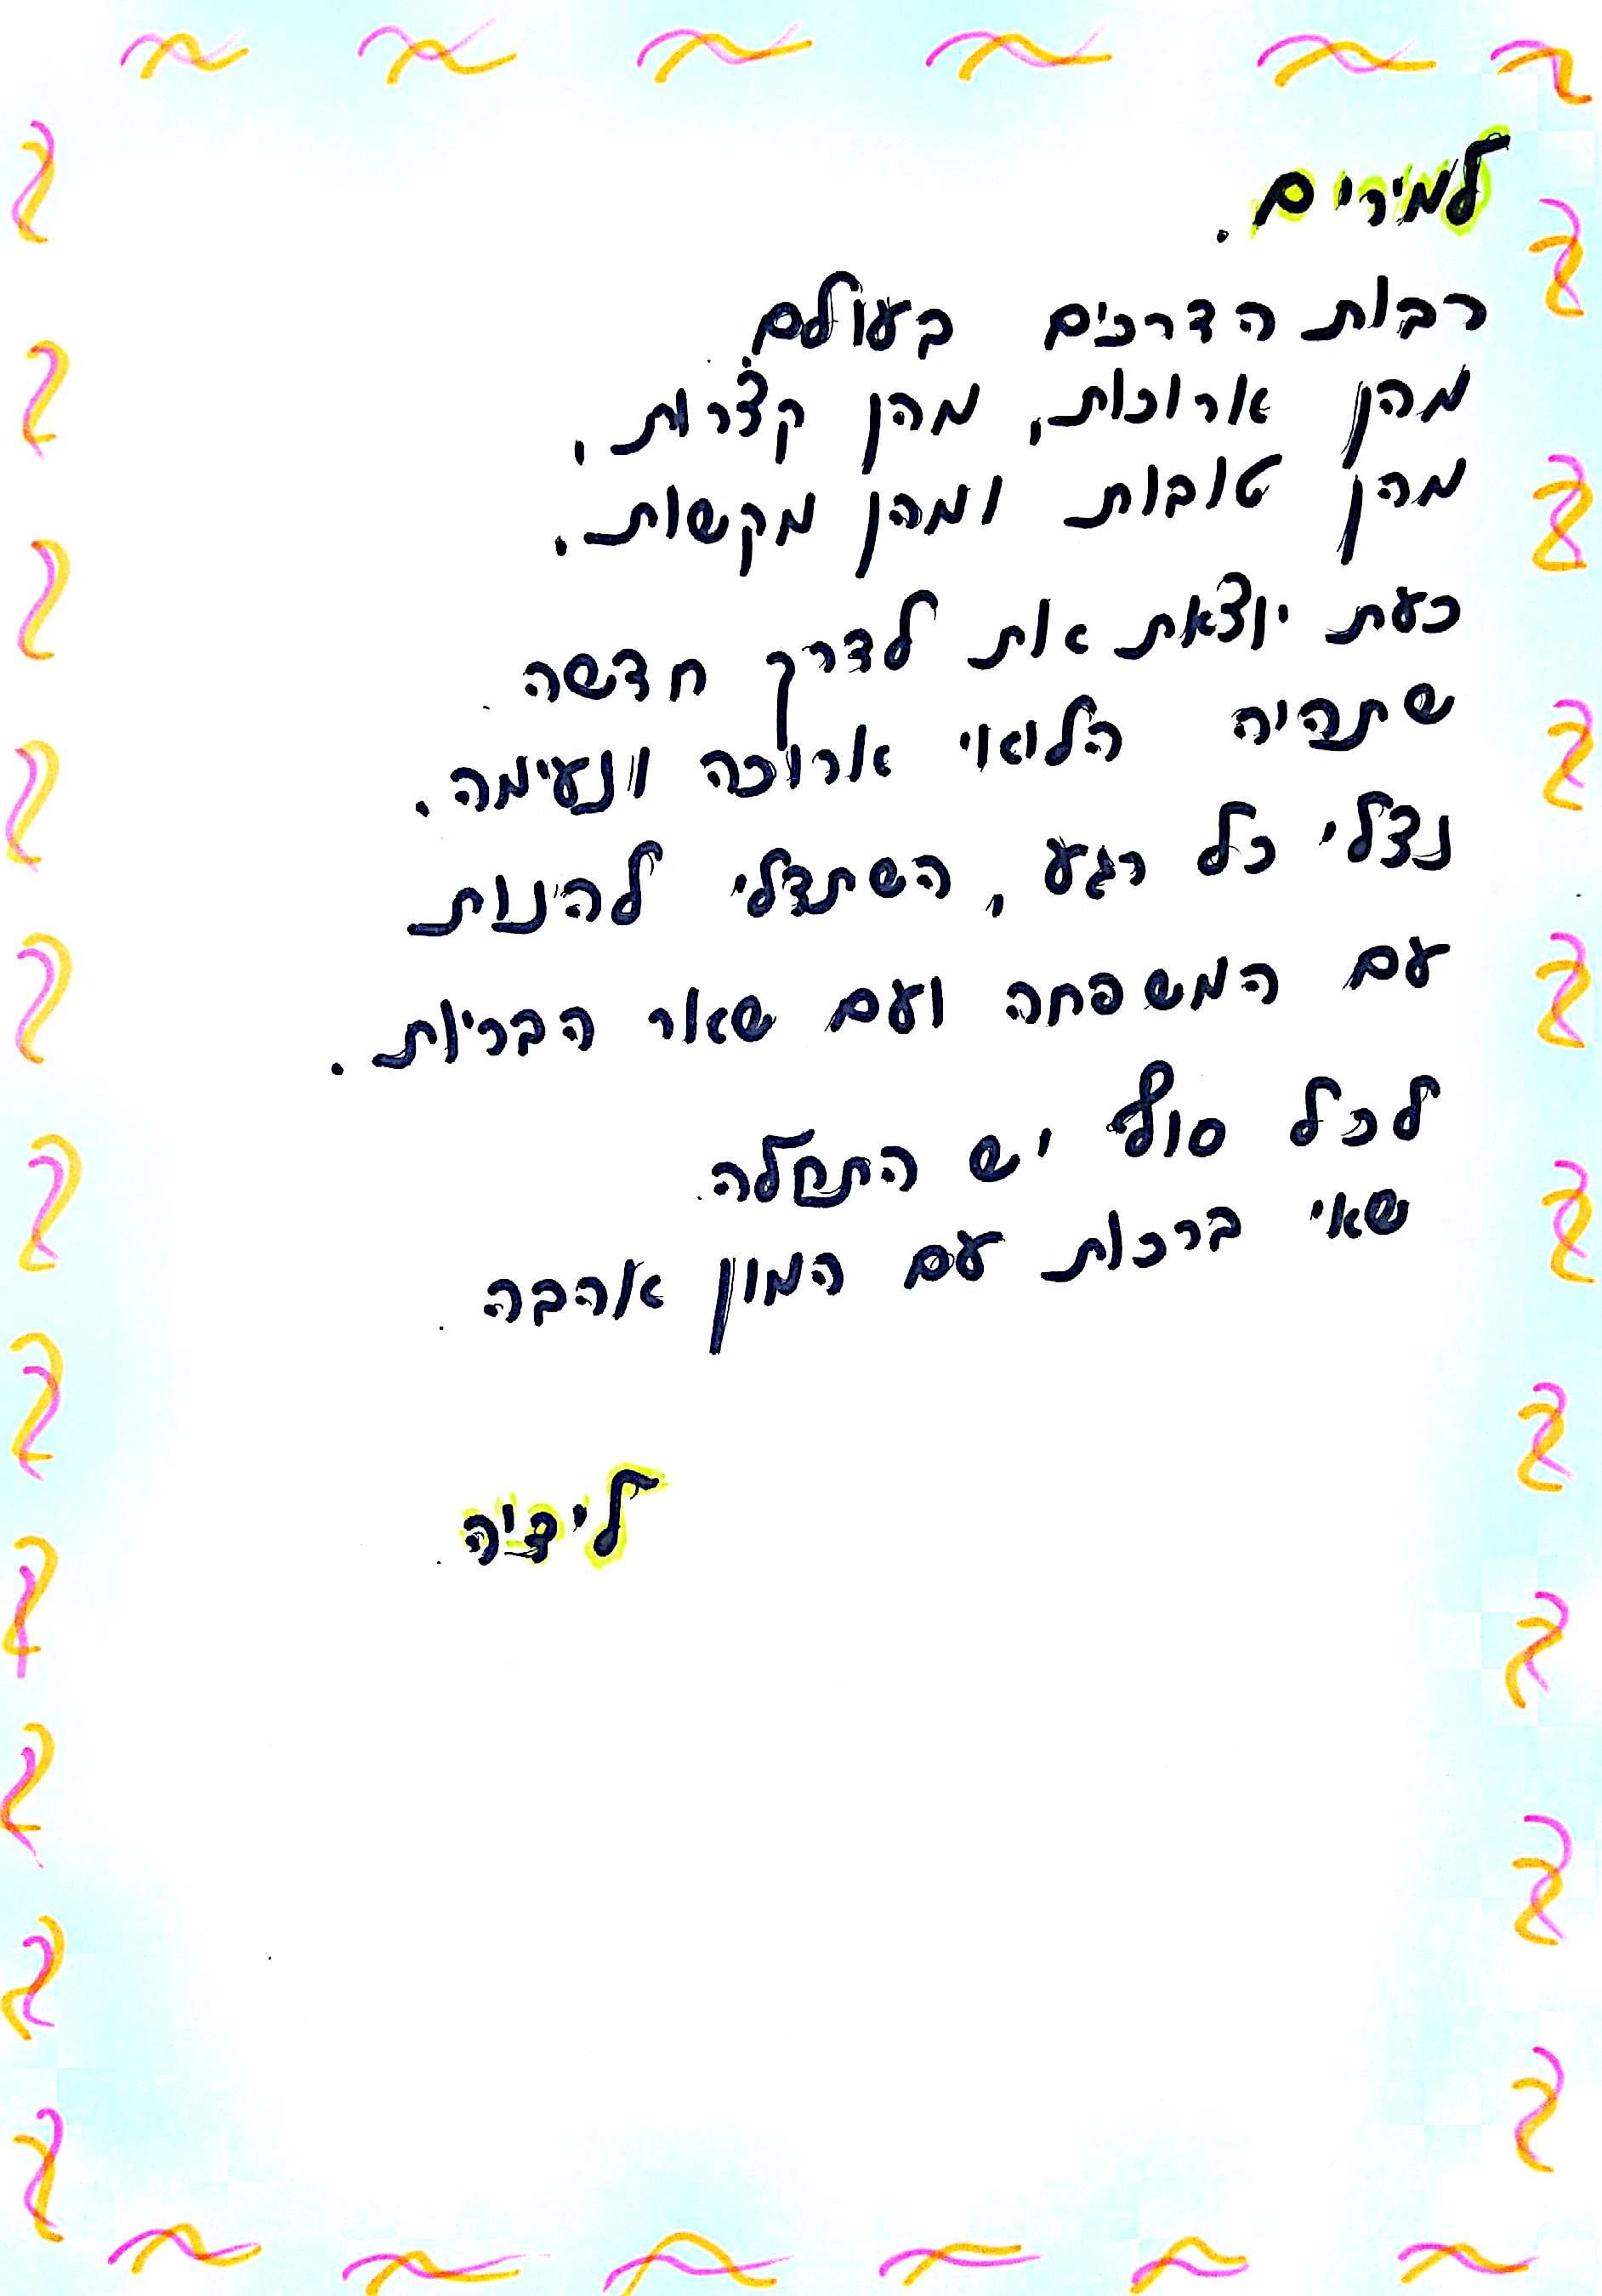 Artwork from the book - מרים, הסביון של בית ספר סביונים אור יהודה by אילן  - Ourboox.com